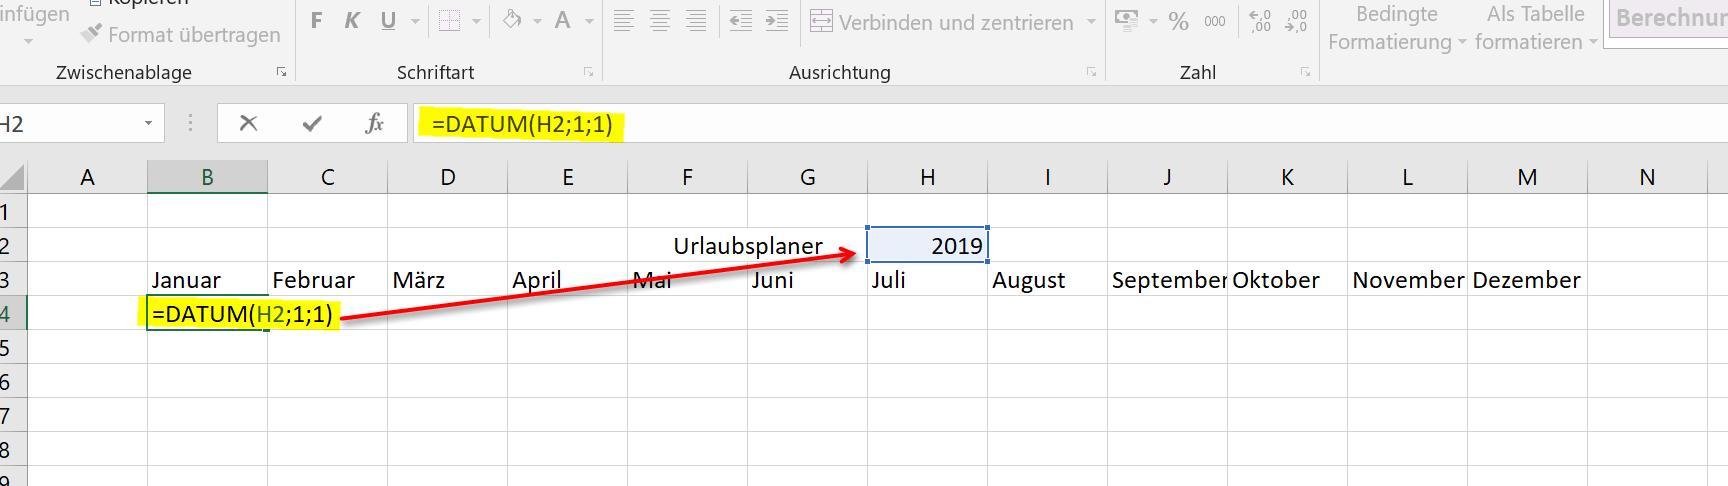 Kalenderstruktur aufbauen